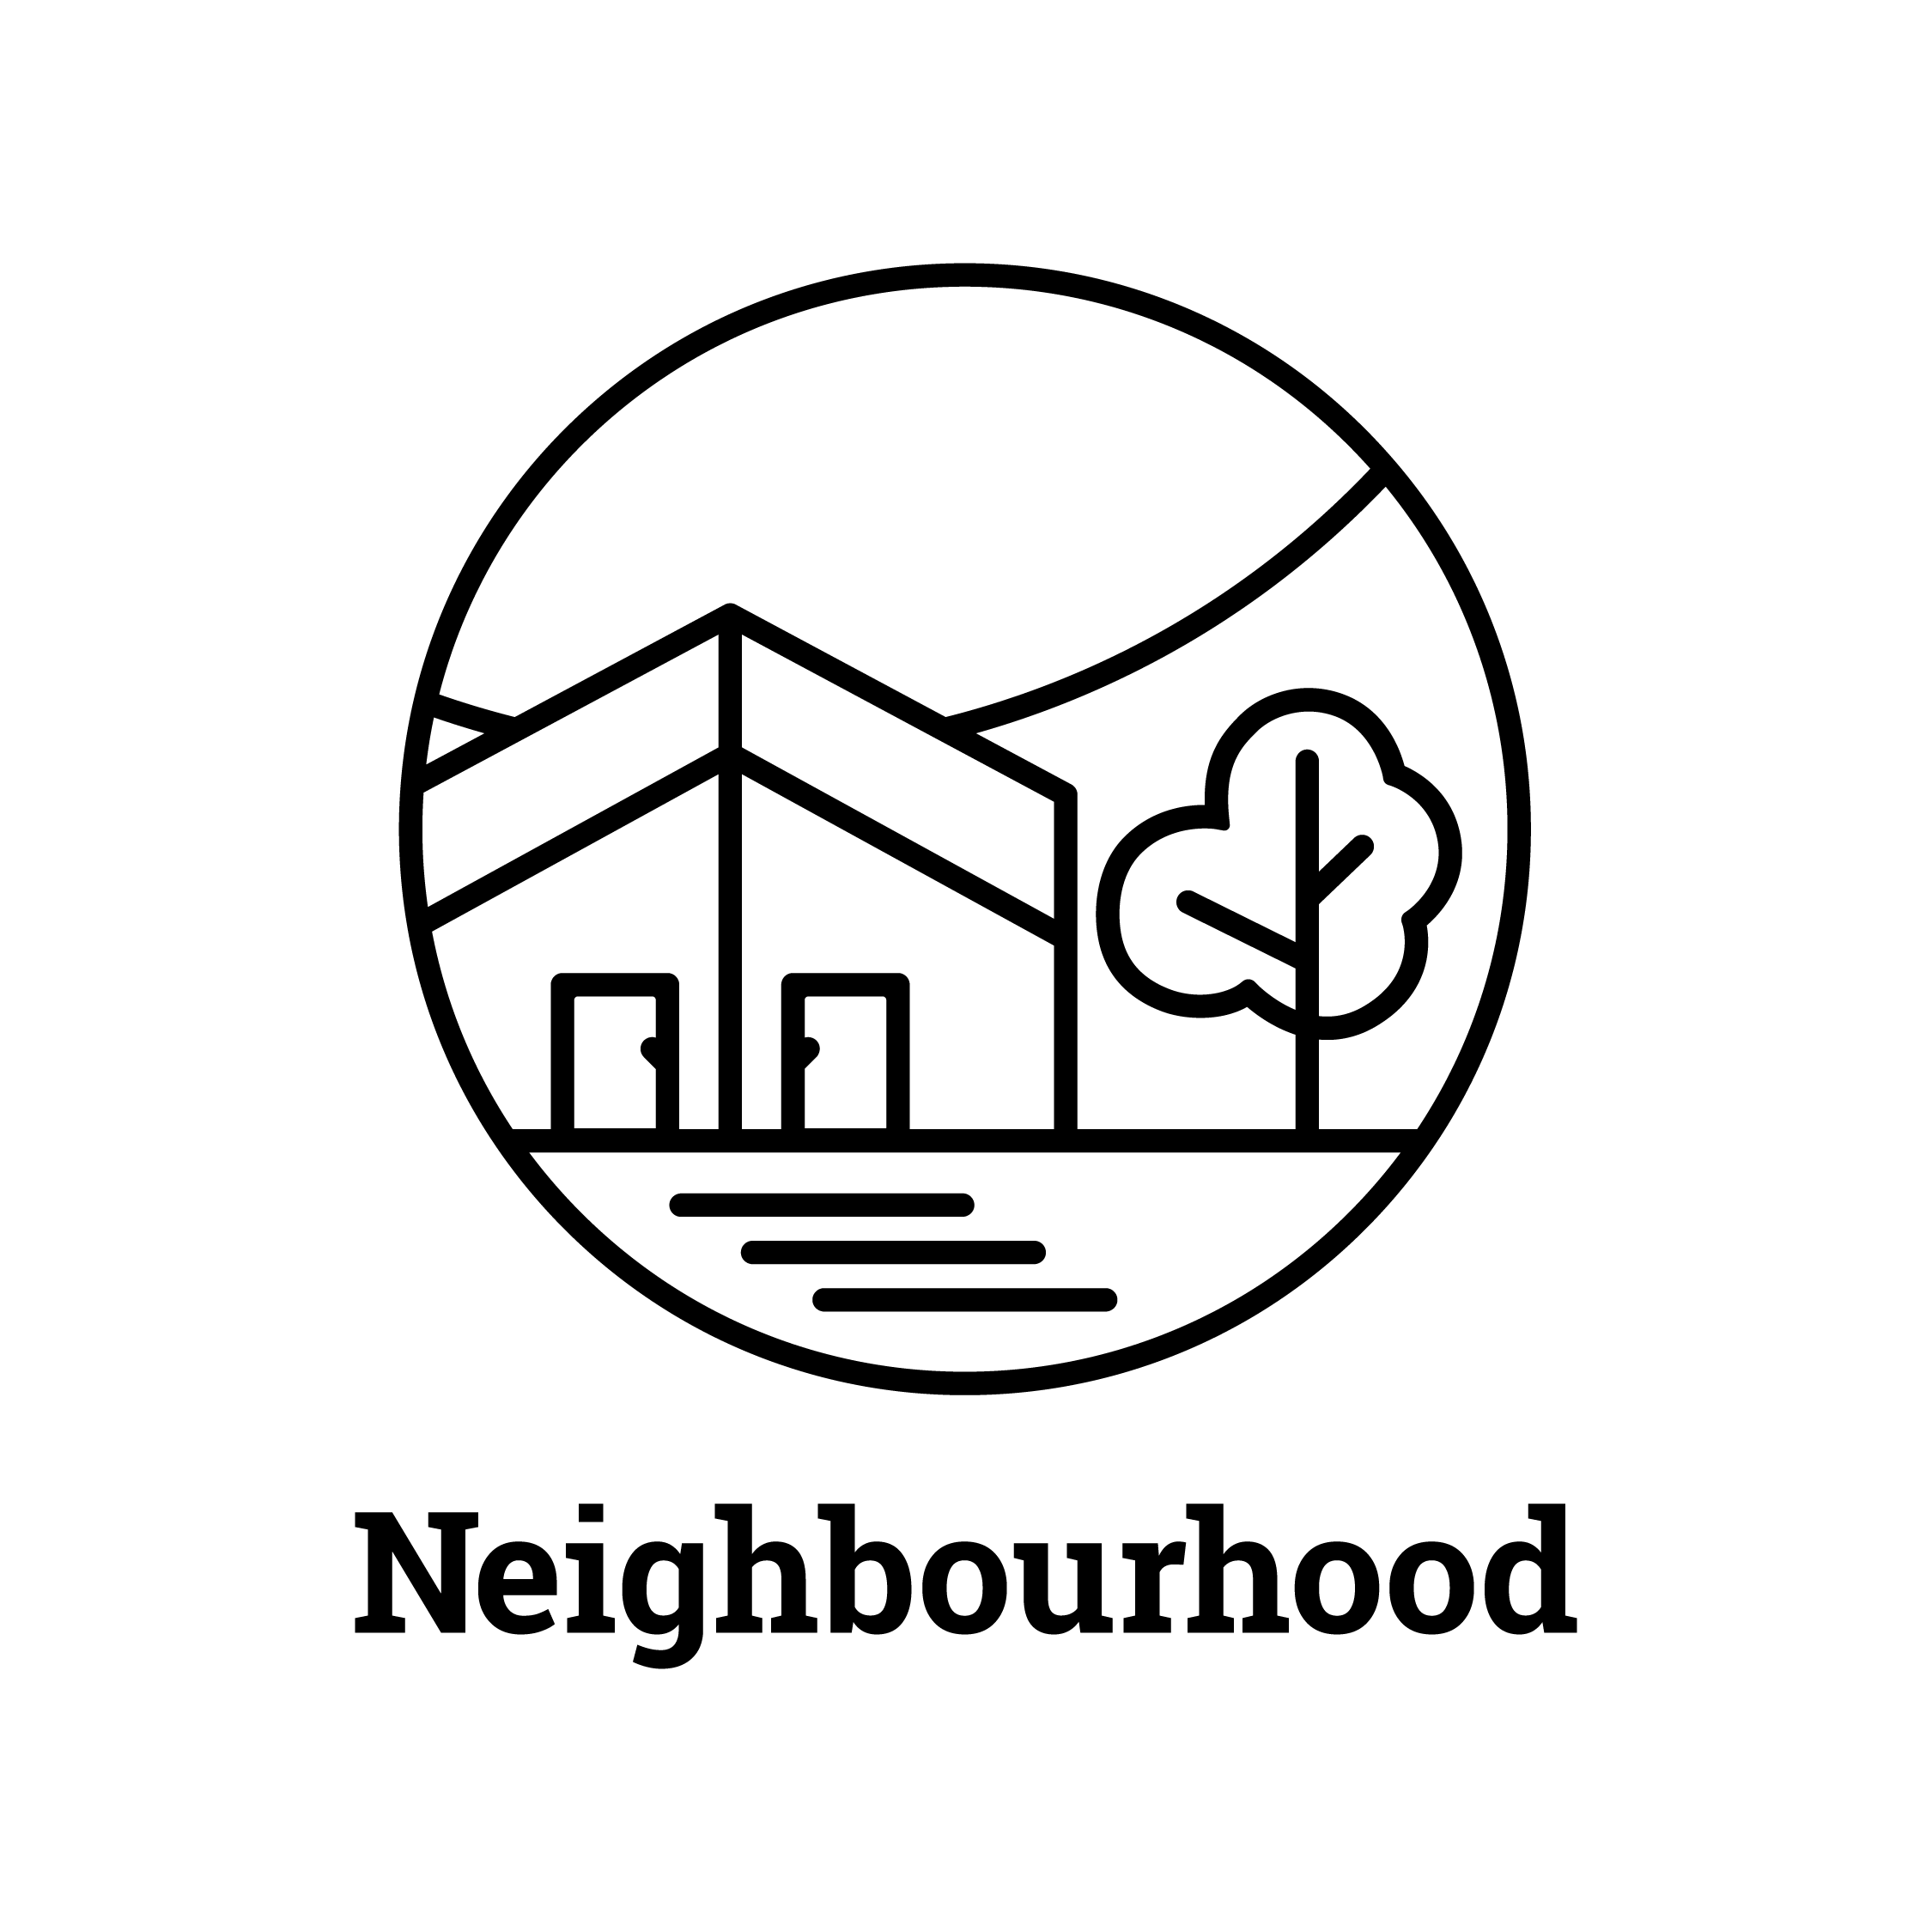 2-Neighbourhood-Master-Sheet-RGB-01.png